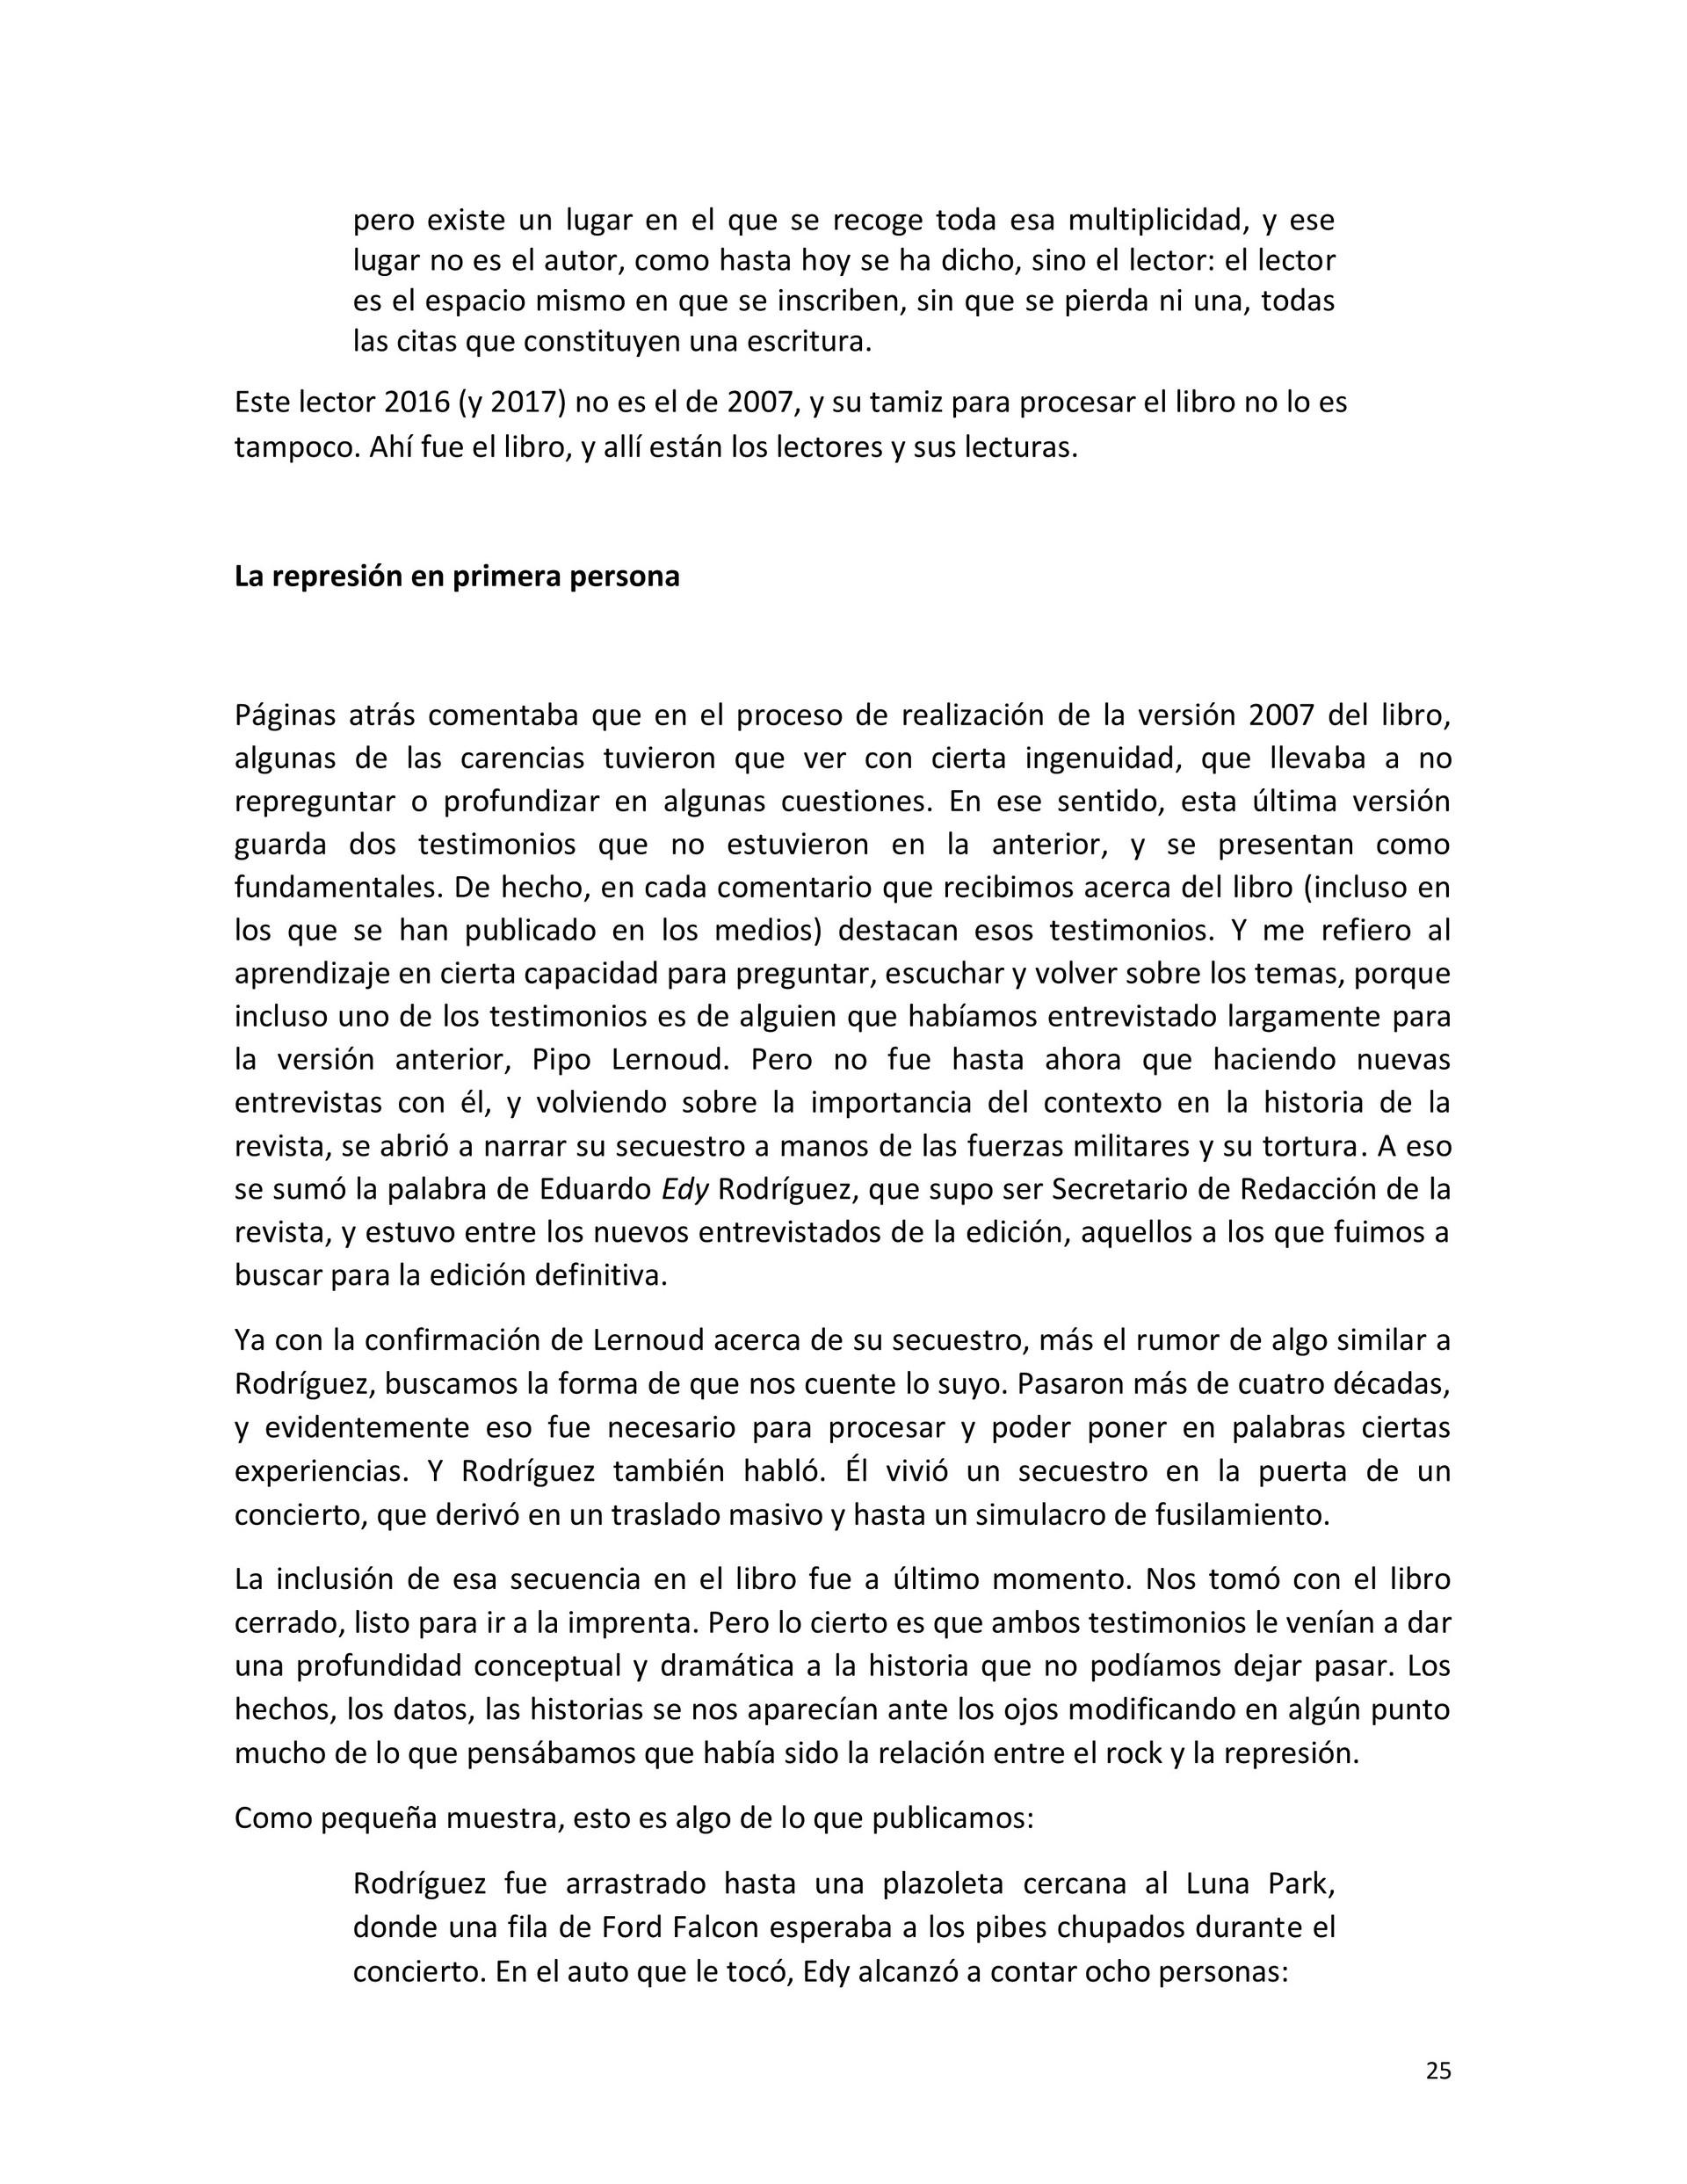 estacion_Page_24.jpeg